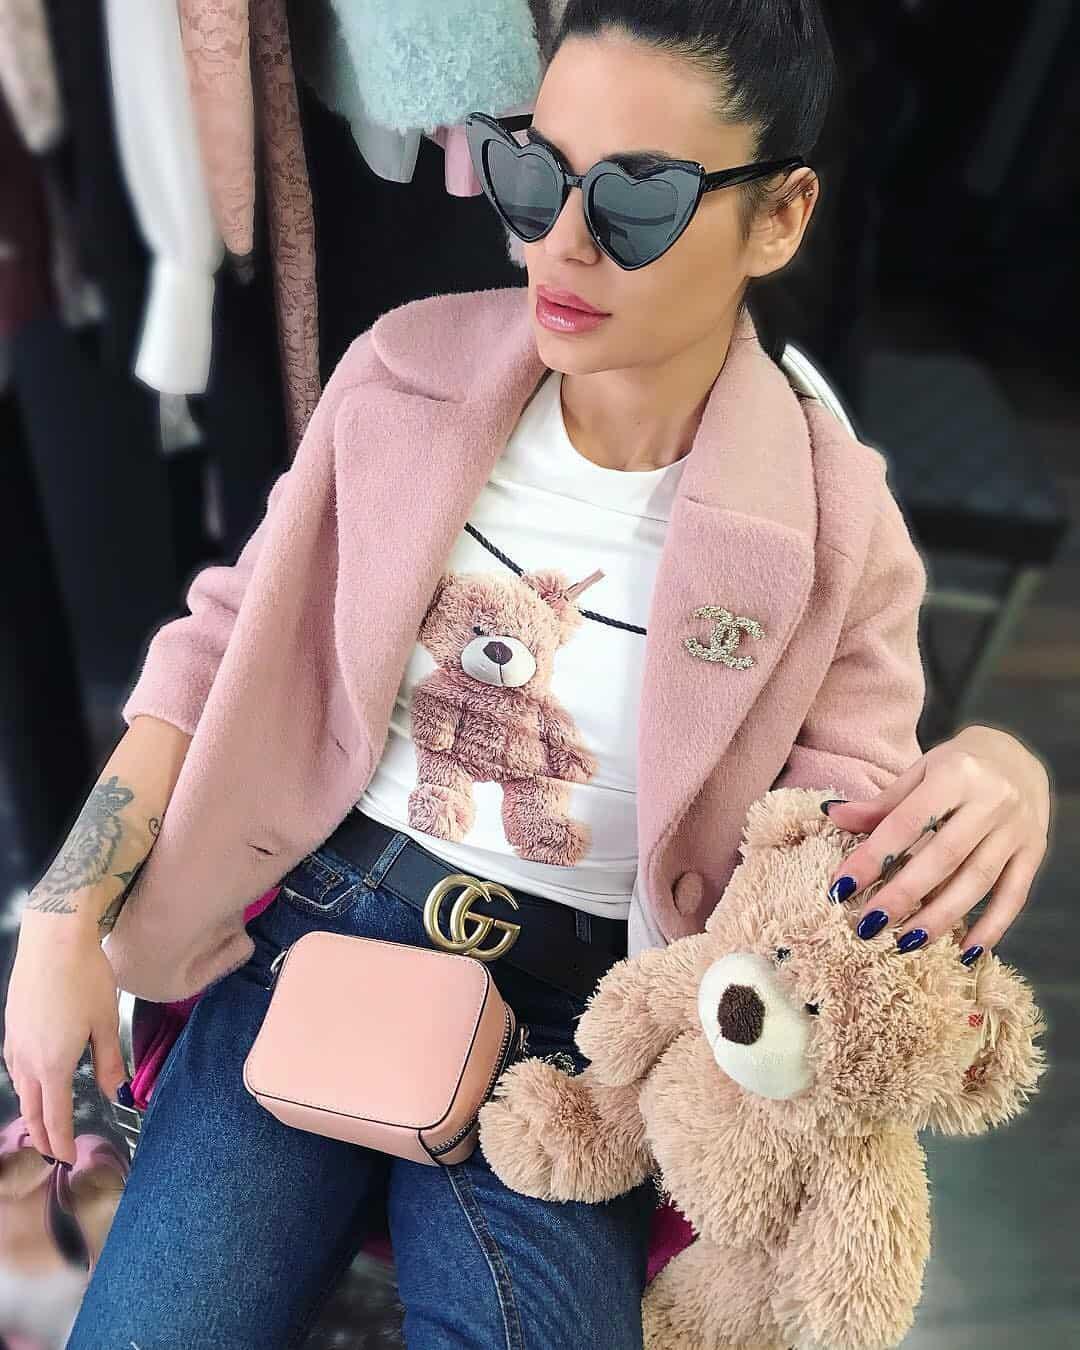 Women's Handbags 2020: Trends and Tendencies for Bags 2020